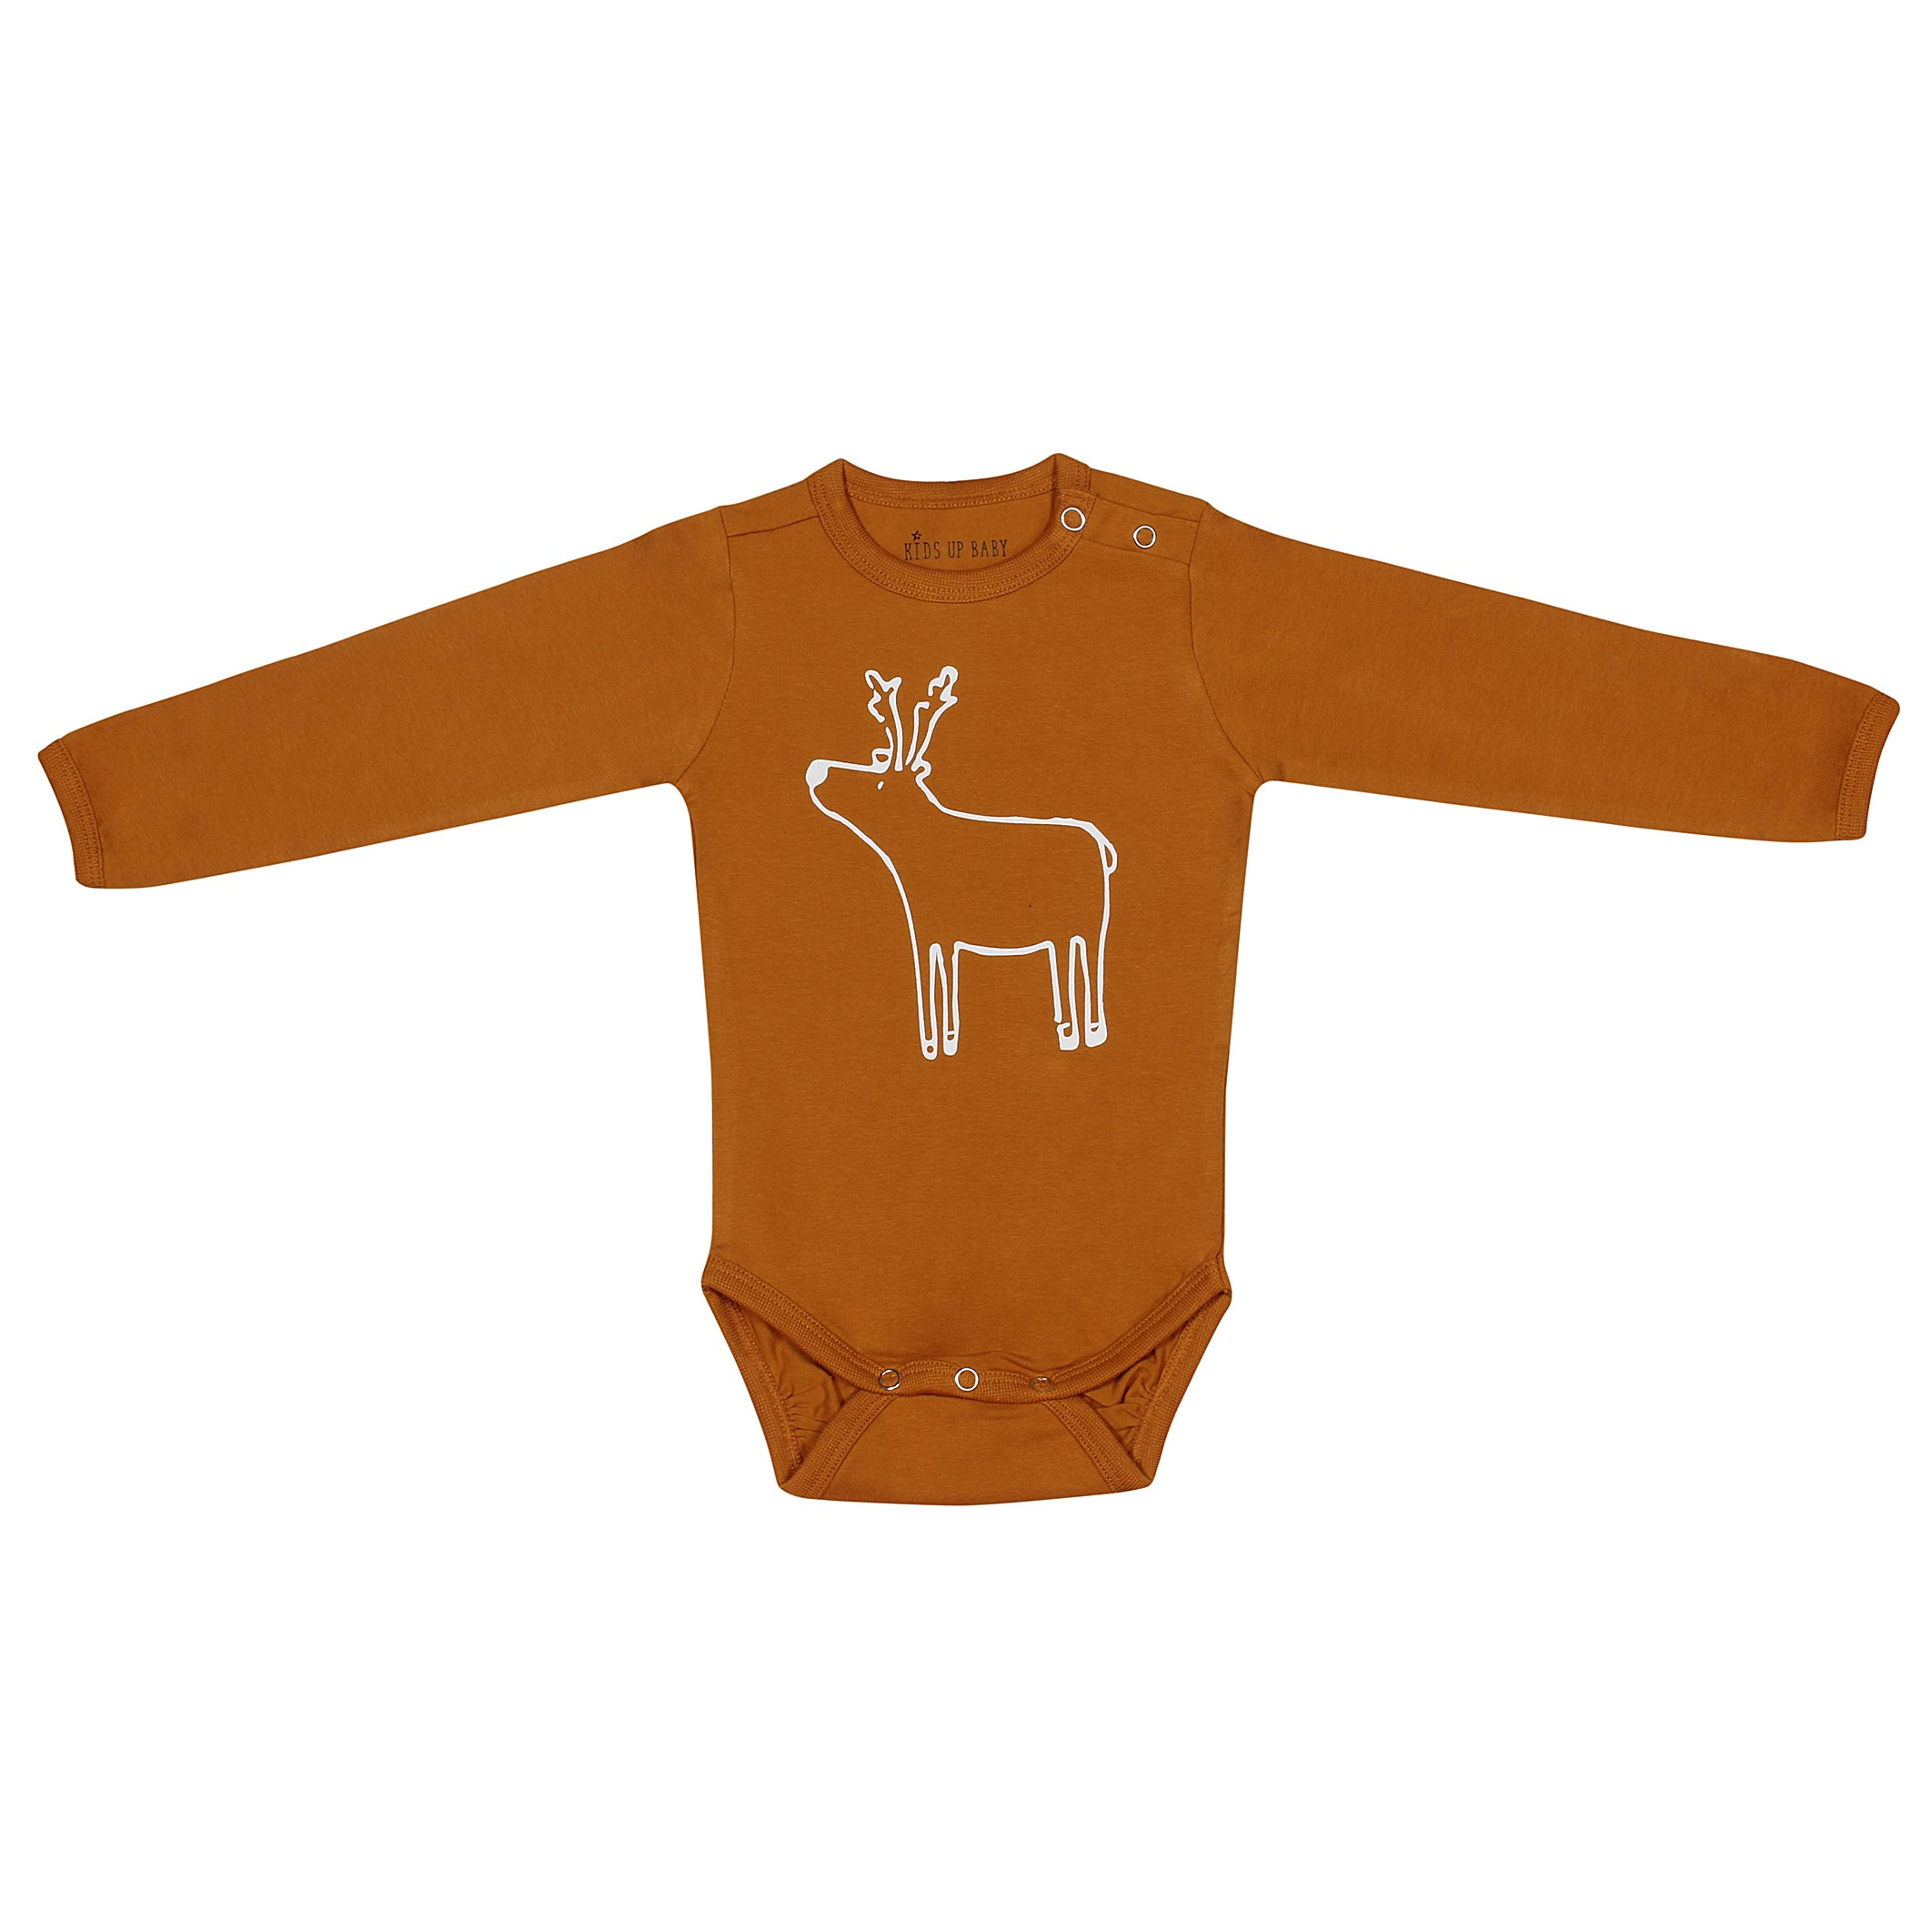 KIDS UP BABY   BODY RENSDYR - KARRY